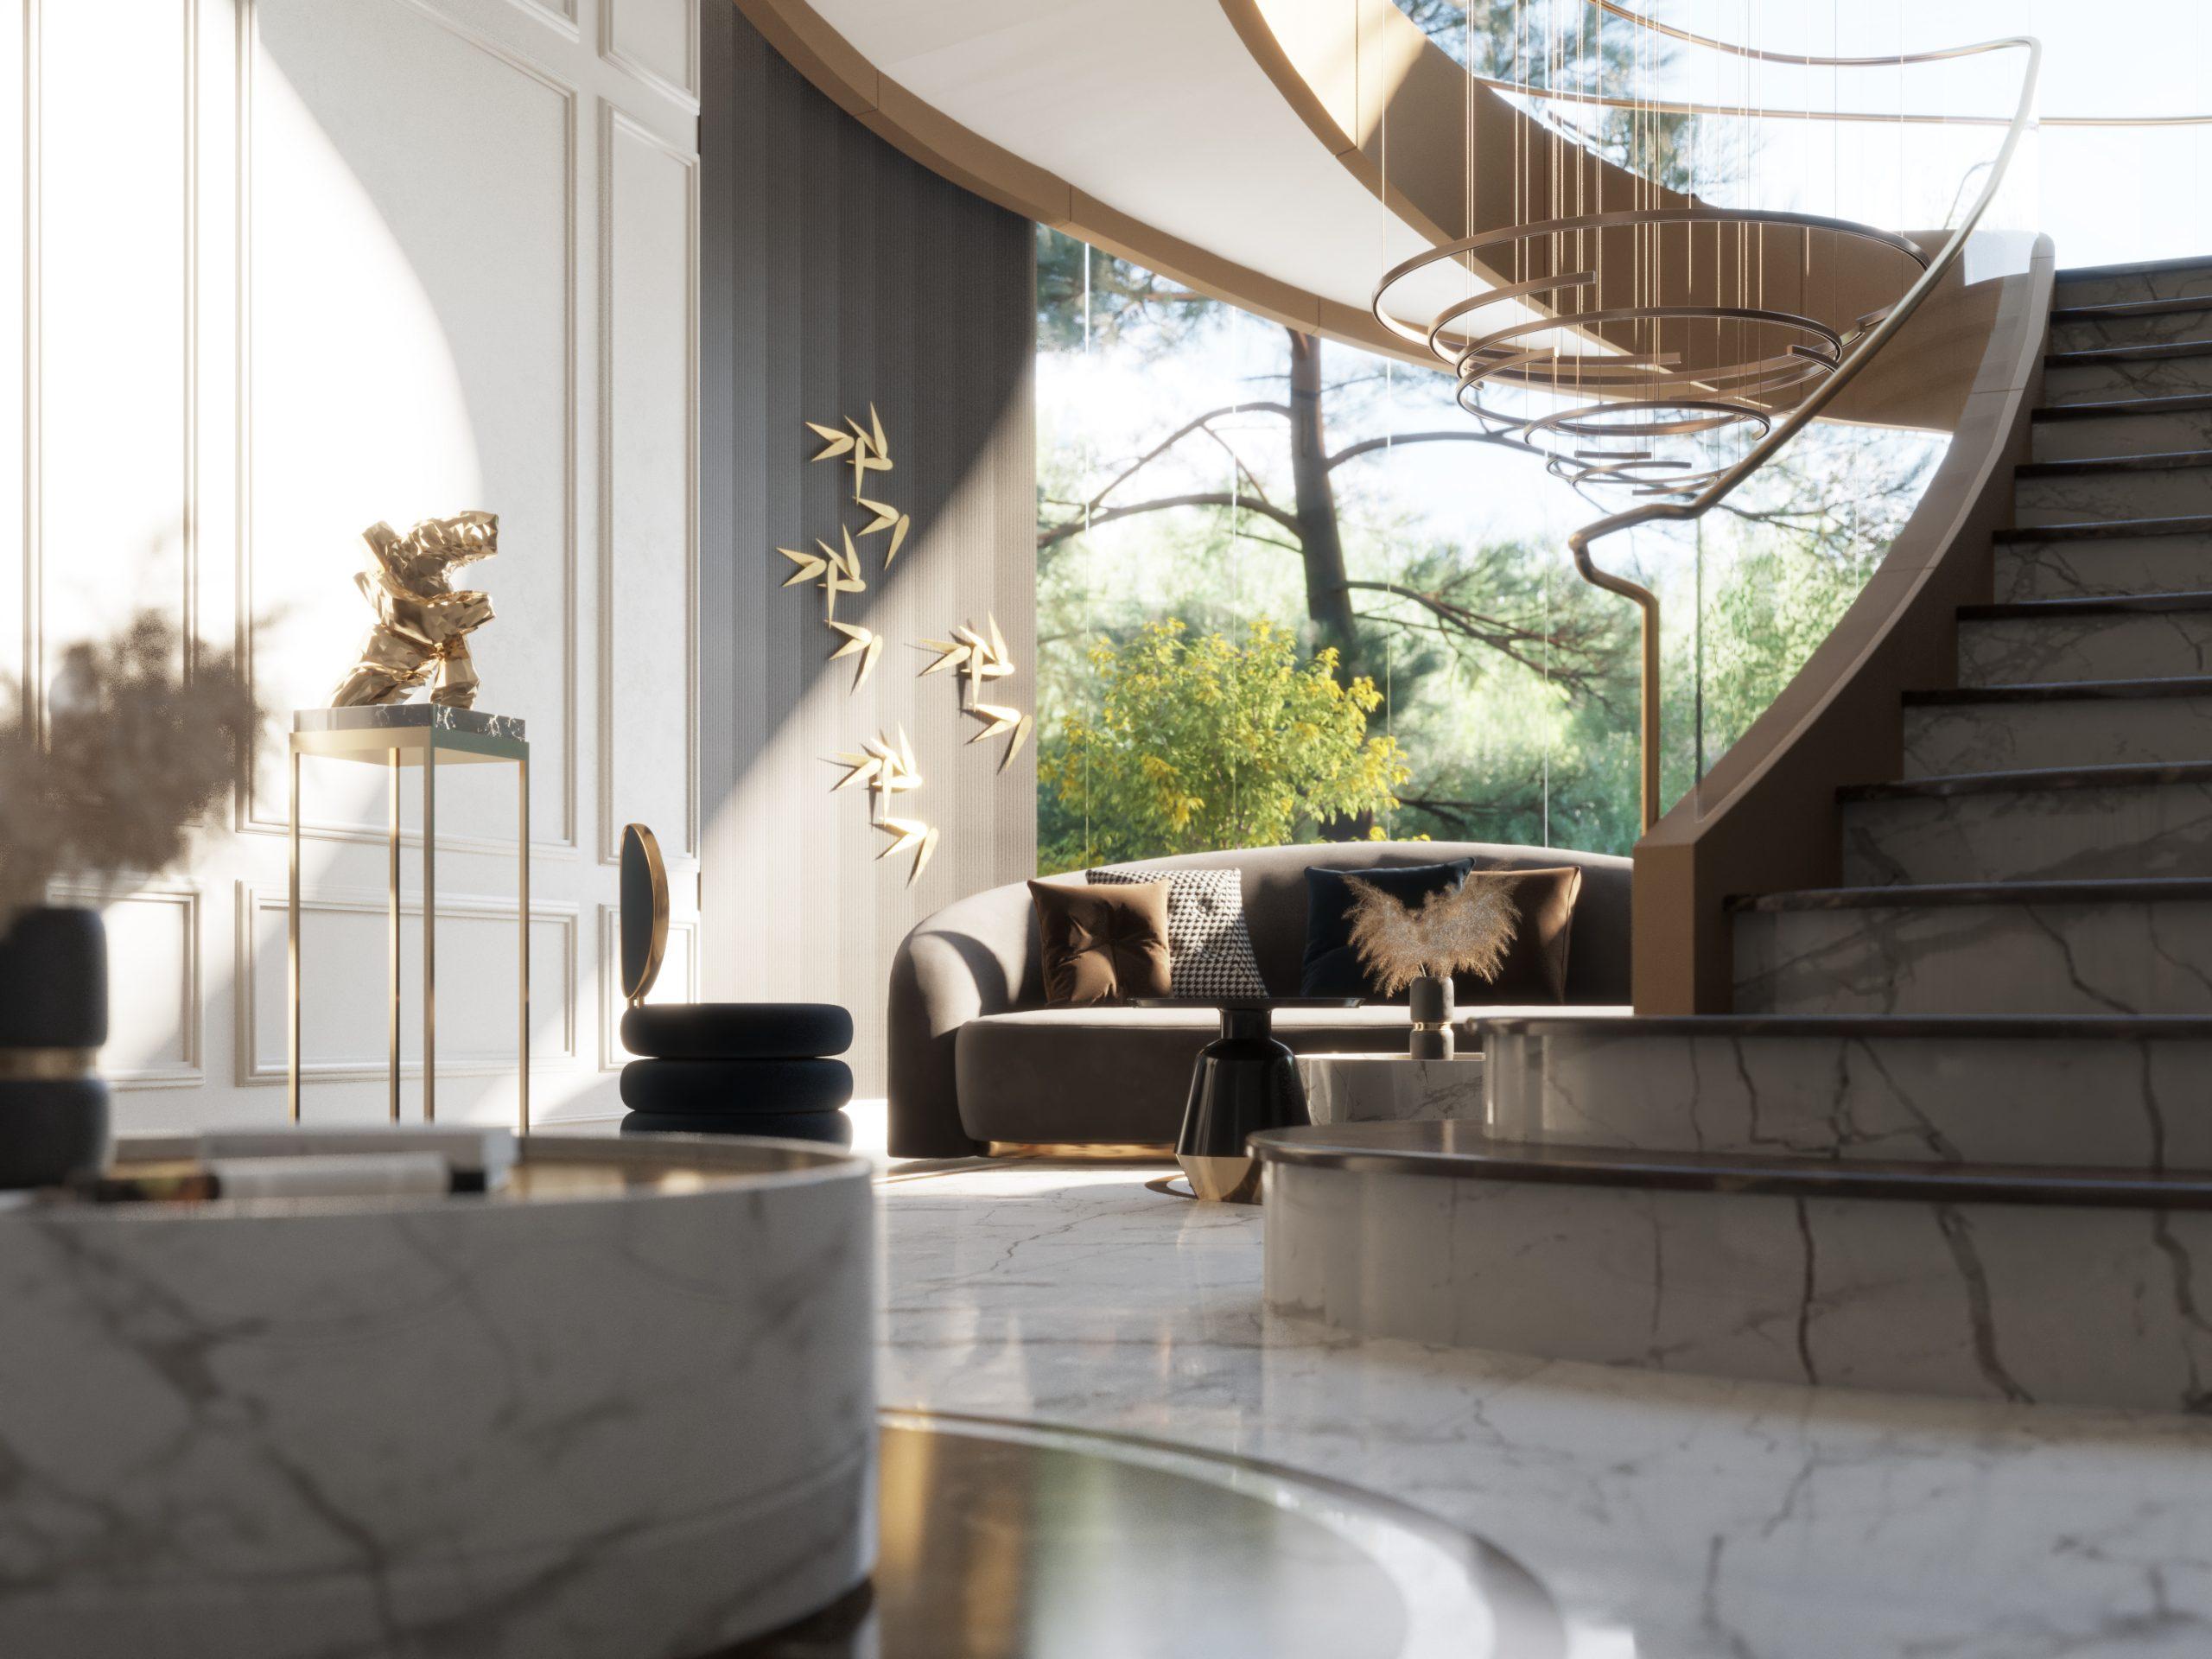 HIGH CLASS MAIN HALL - sun light - stairs - wall design - marble floor